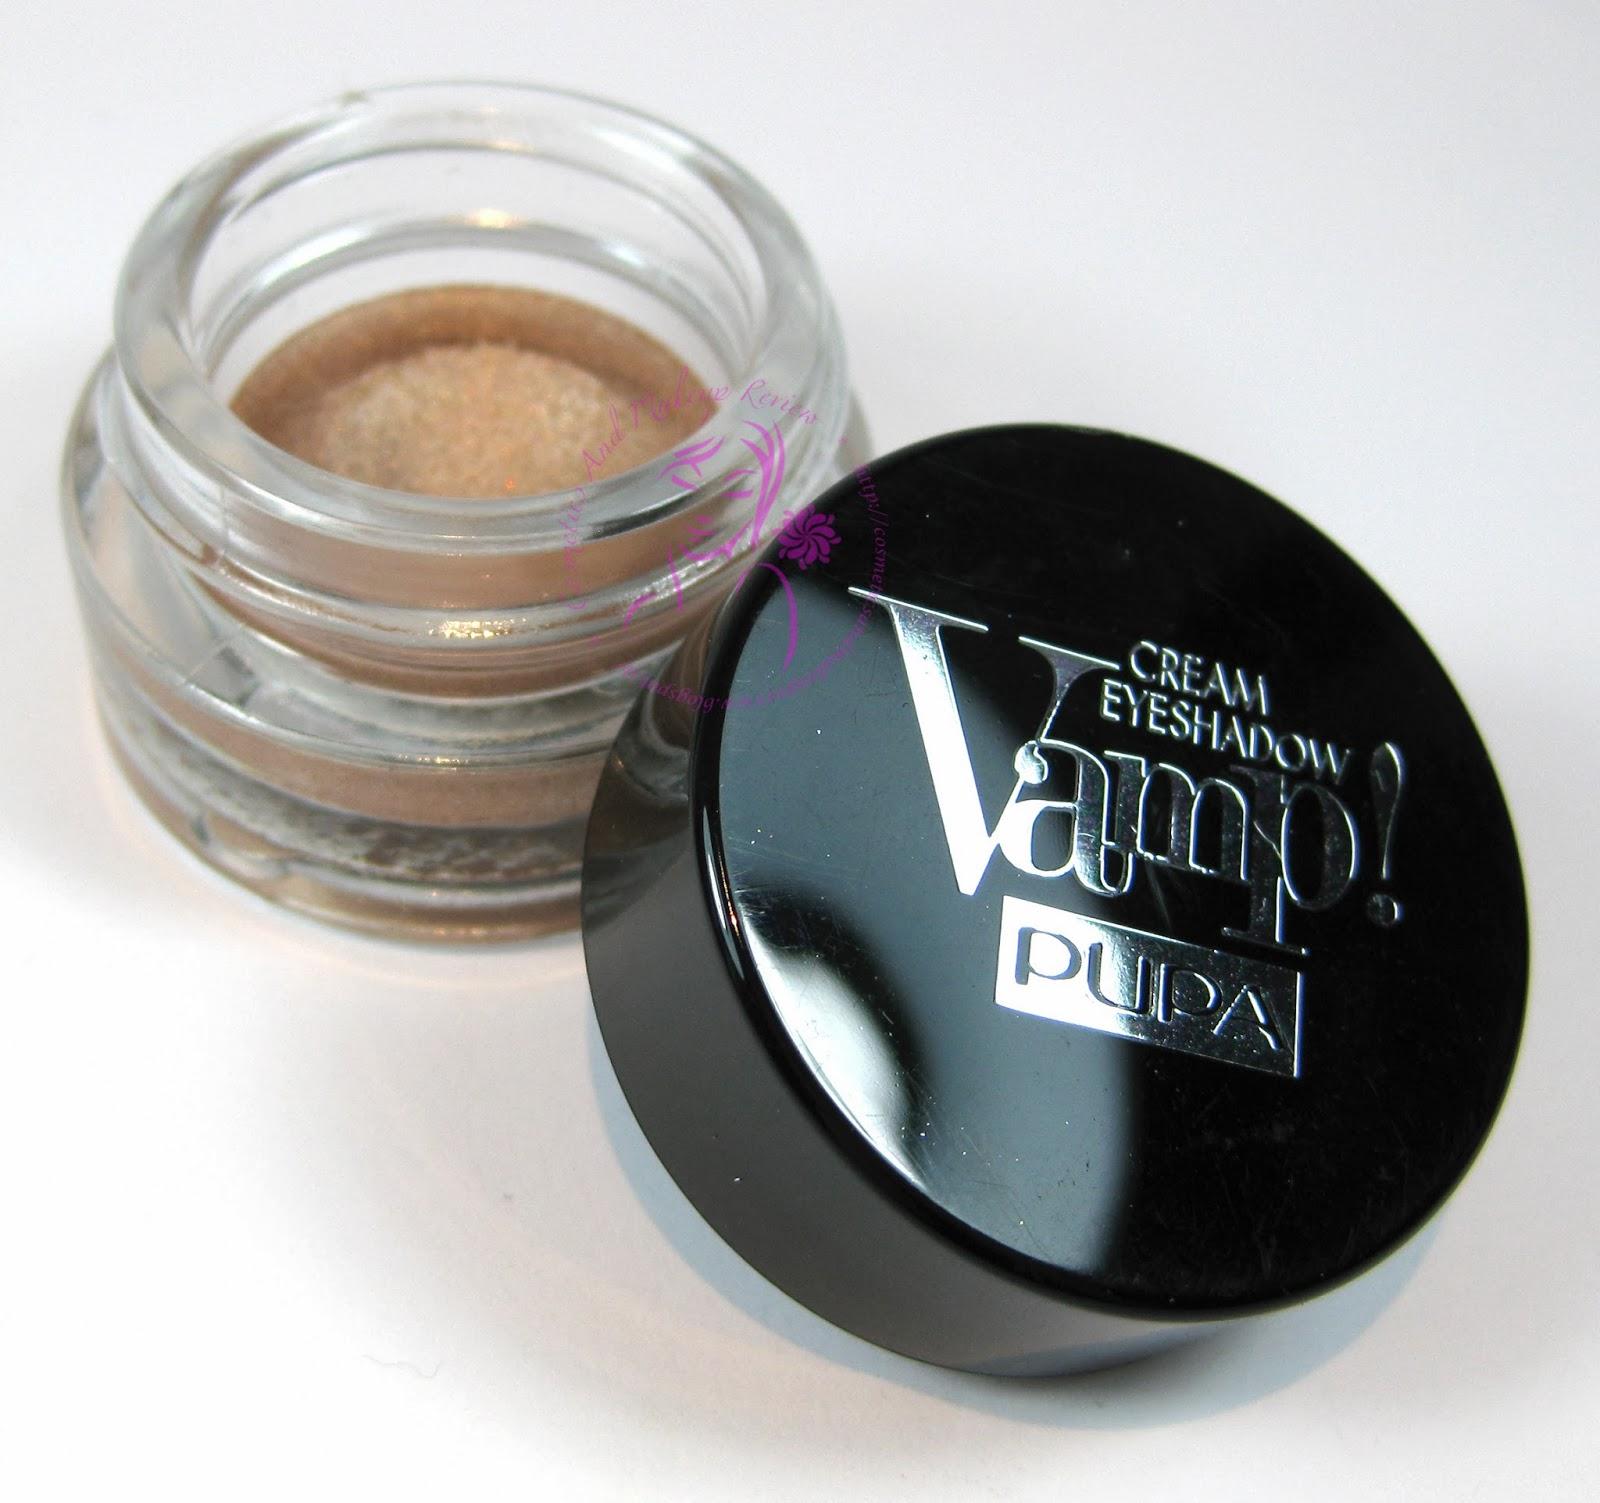 Pupa - Vamp! Cream Eyeshadow n° 100 - Champagne